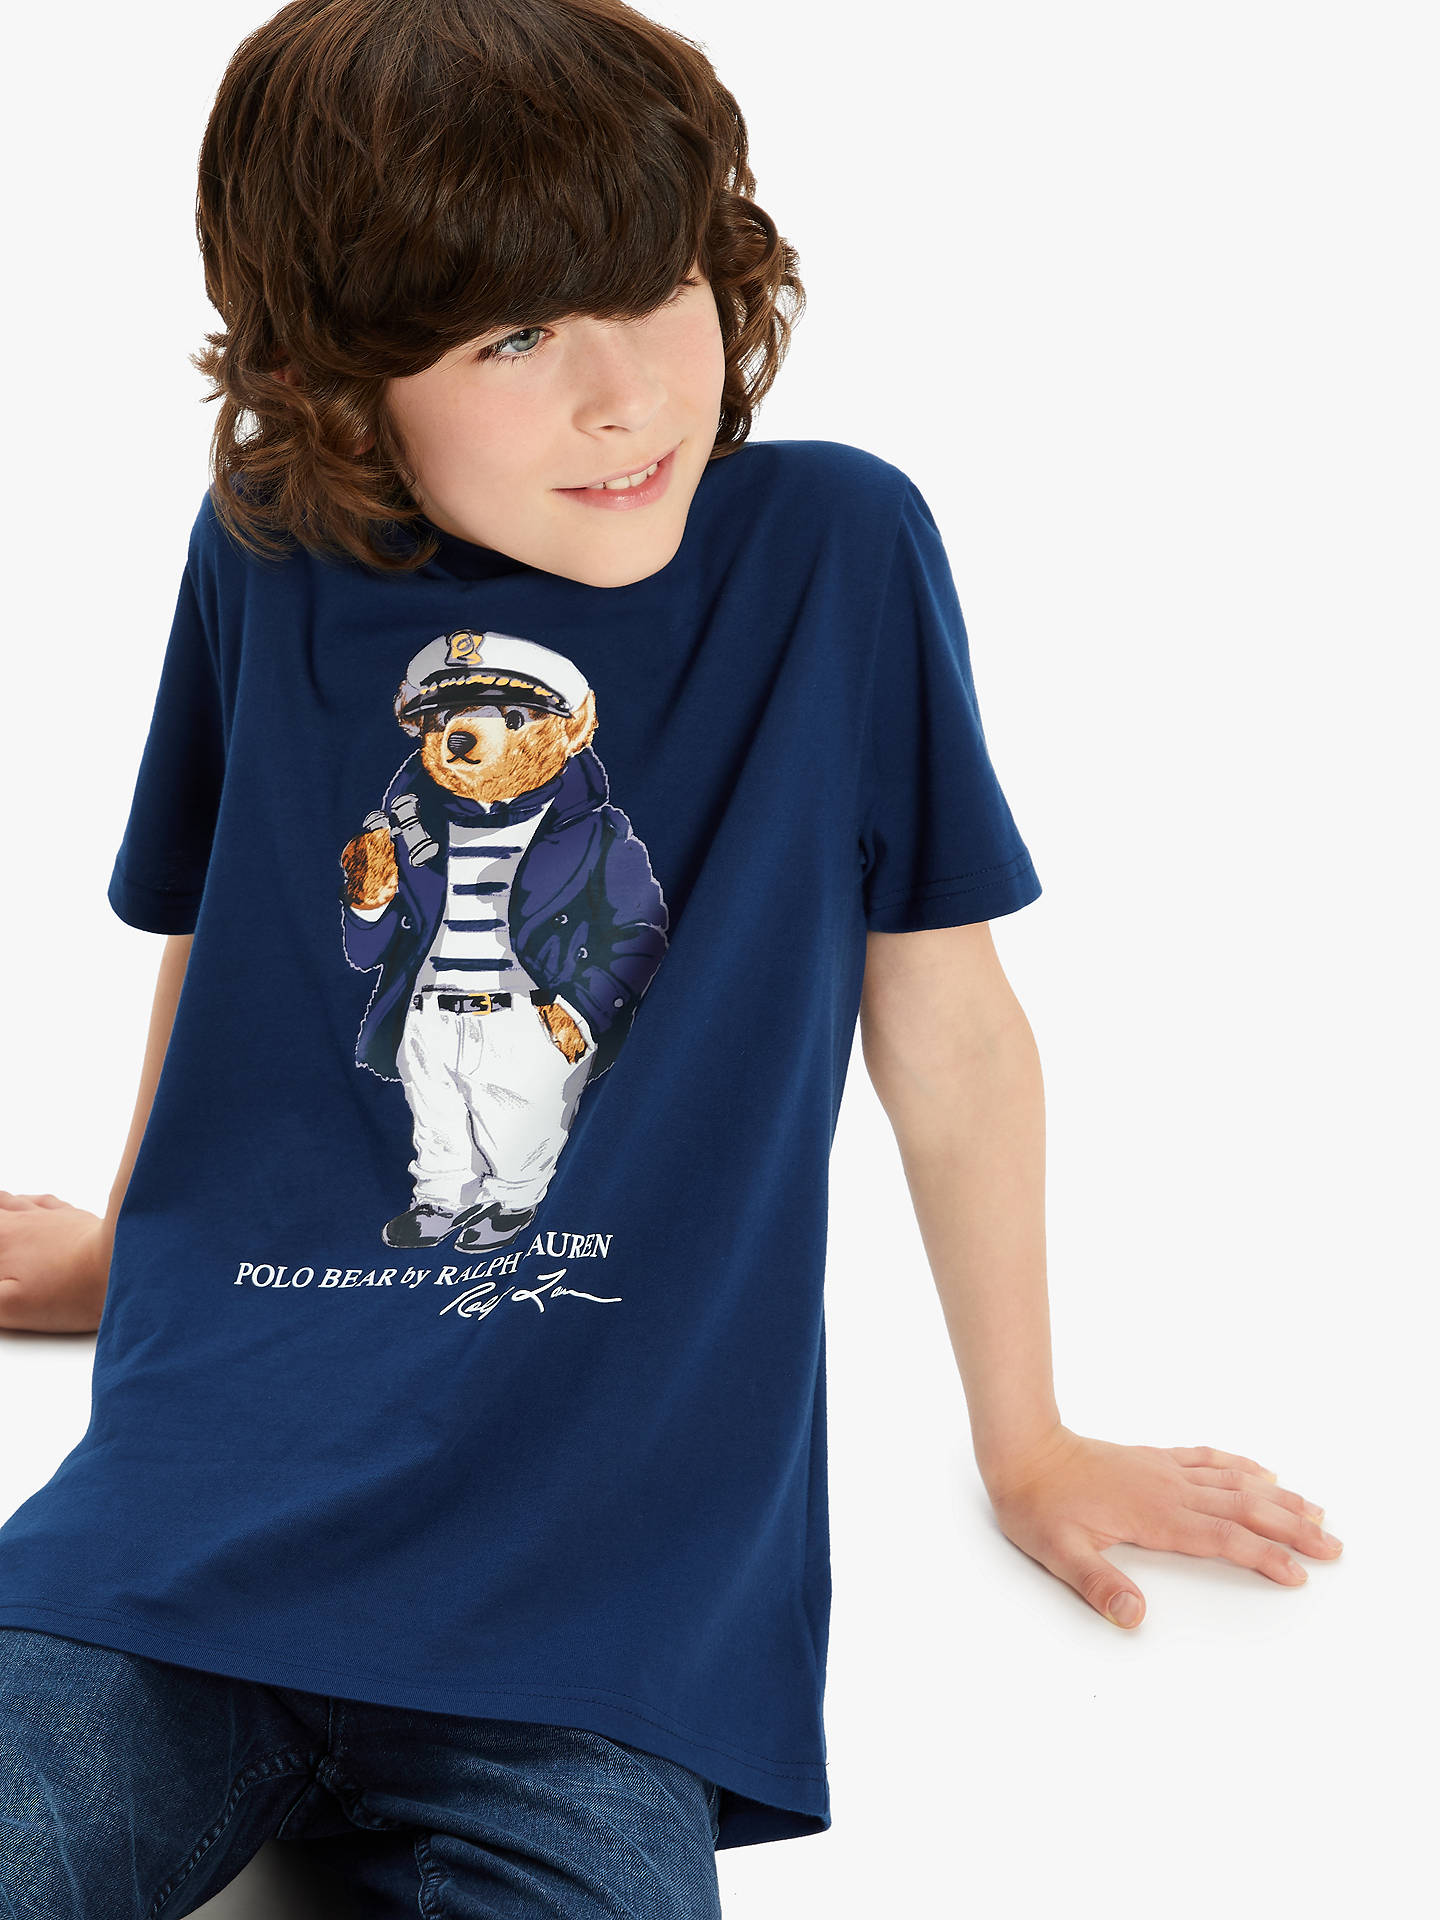 Custom Baby /& Toddler T-Shirt Girl Bed Brown Hair Cotton Boy Girl Clothes